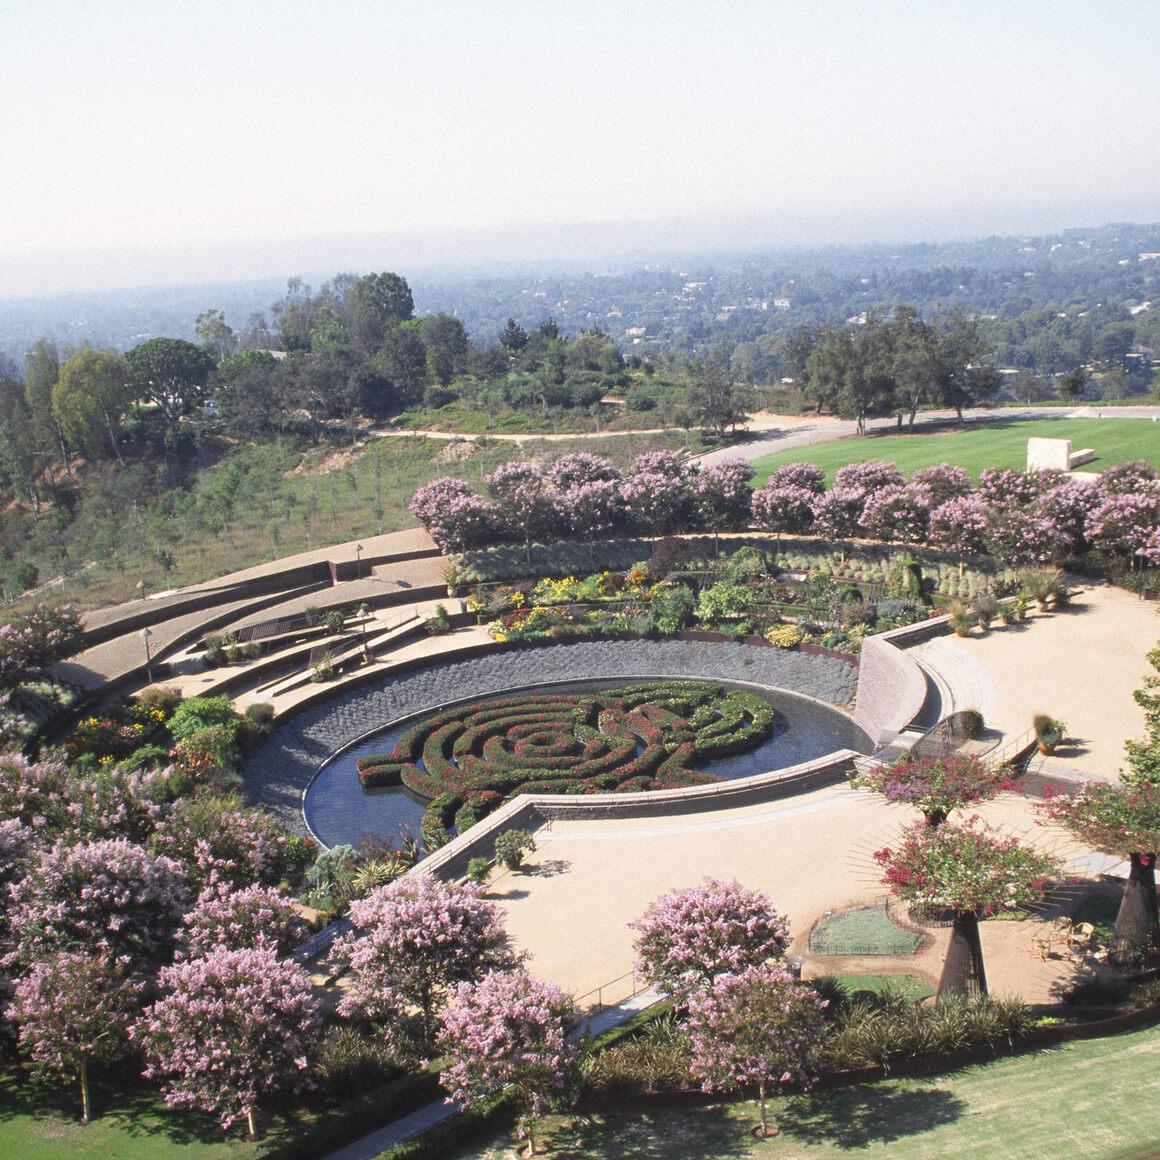 Central Garden designed by Robert Irwin